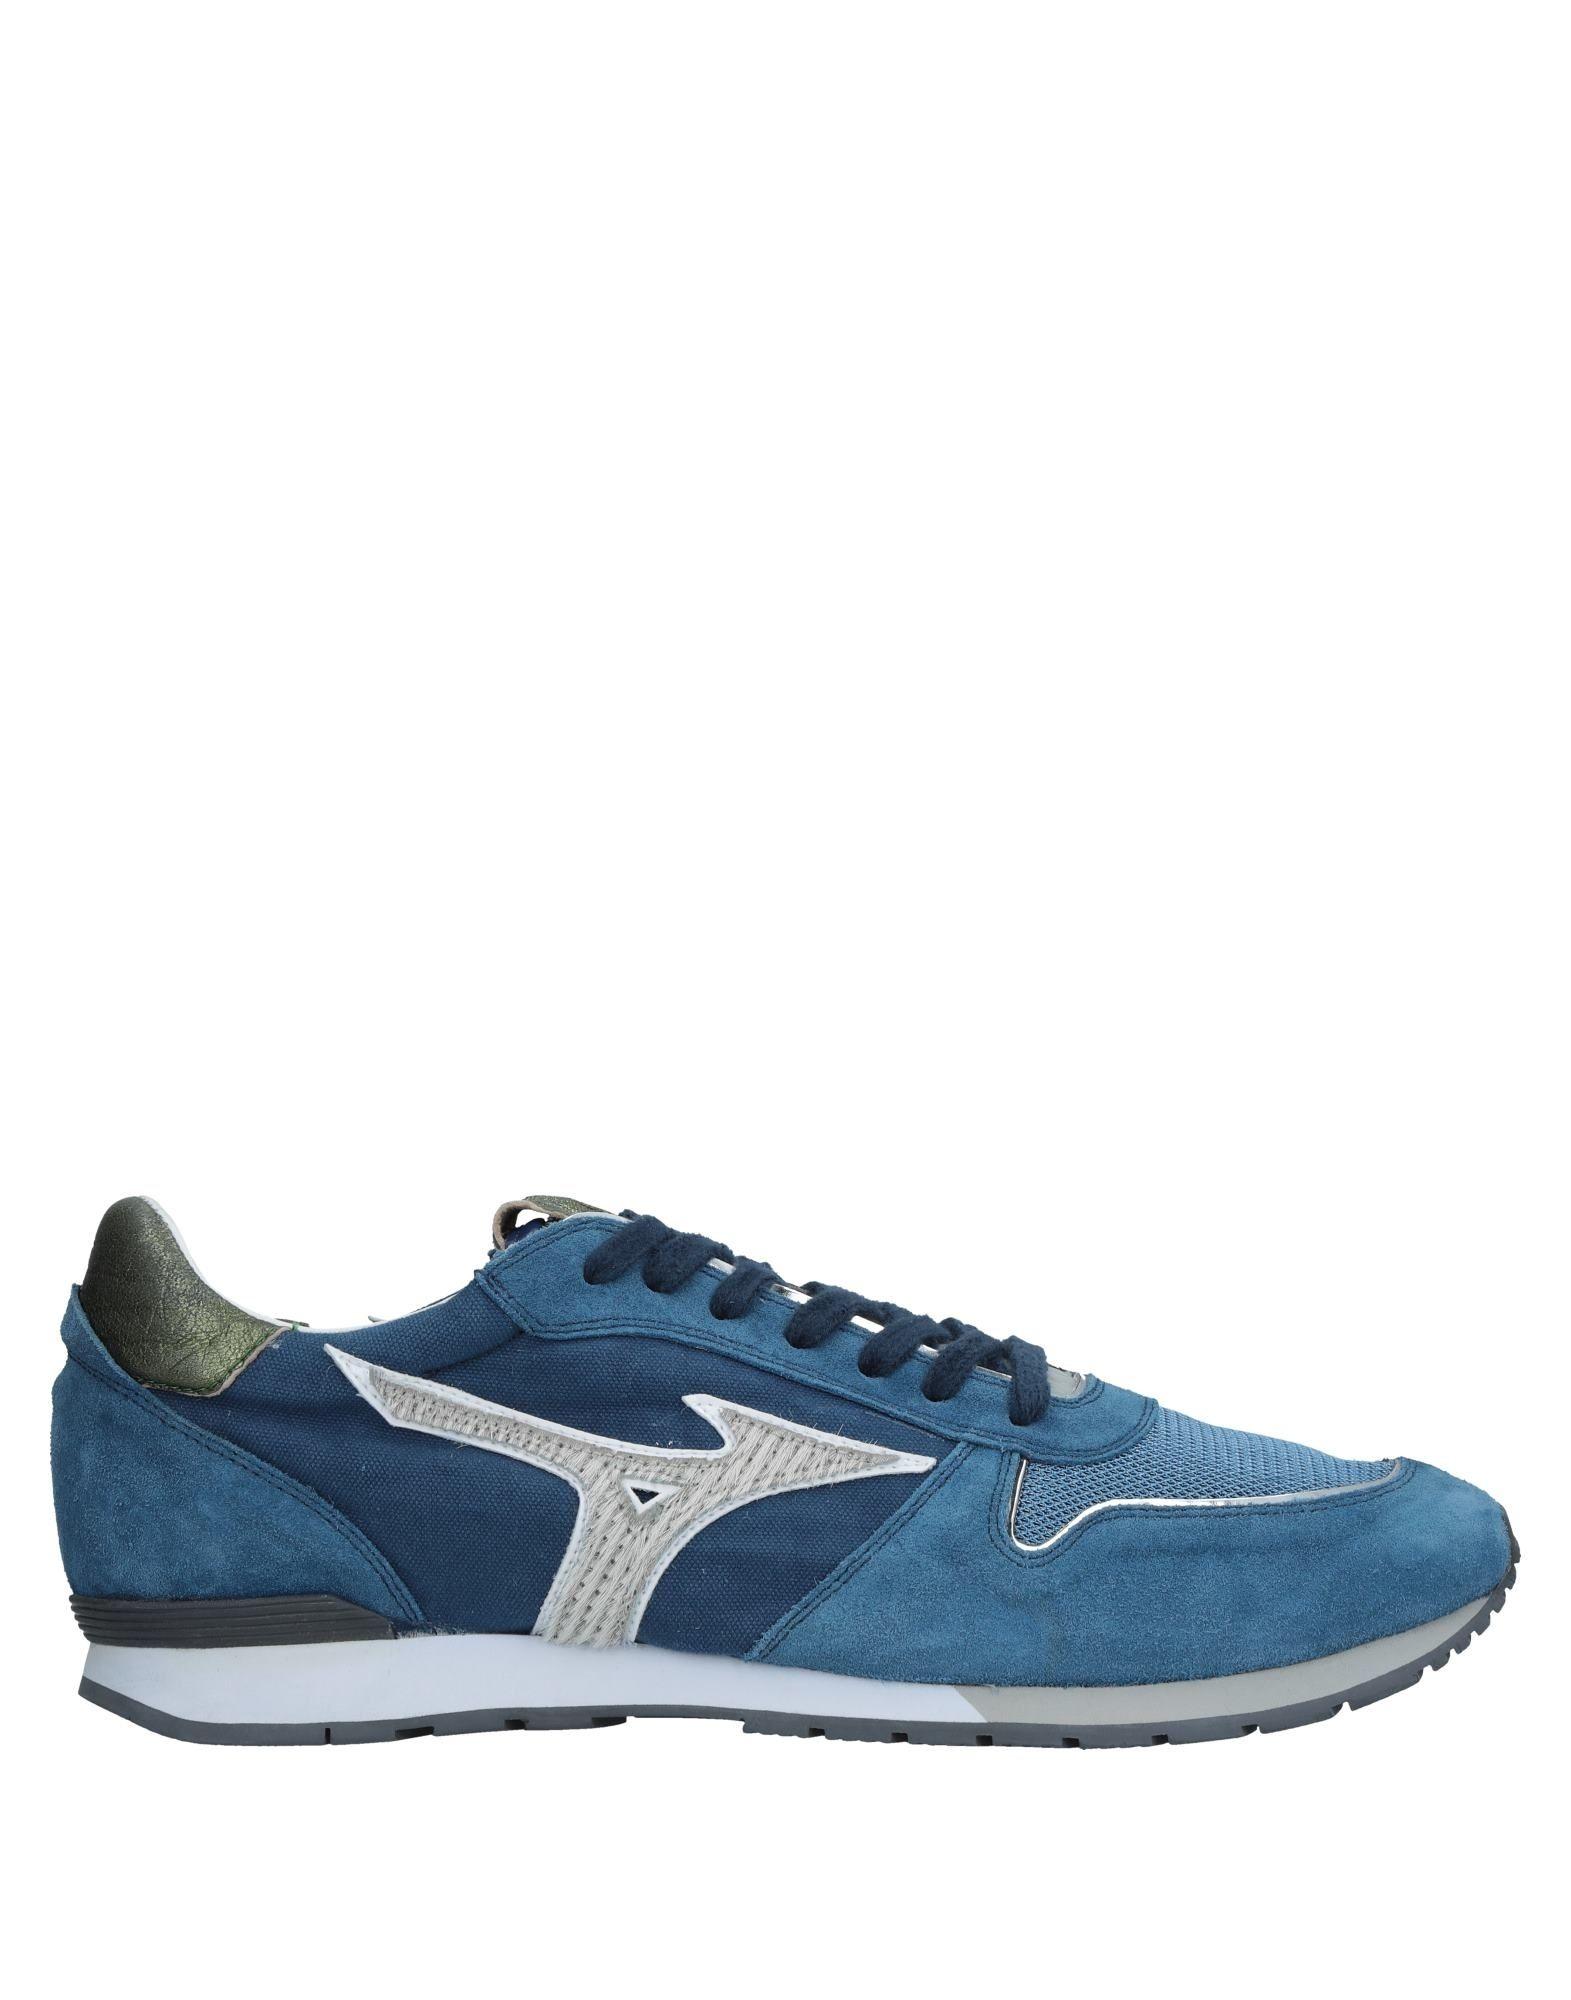 Moda Uomo Sneakers Mizuno Uomo Moda - 11524211RB 6b3fcc